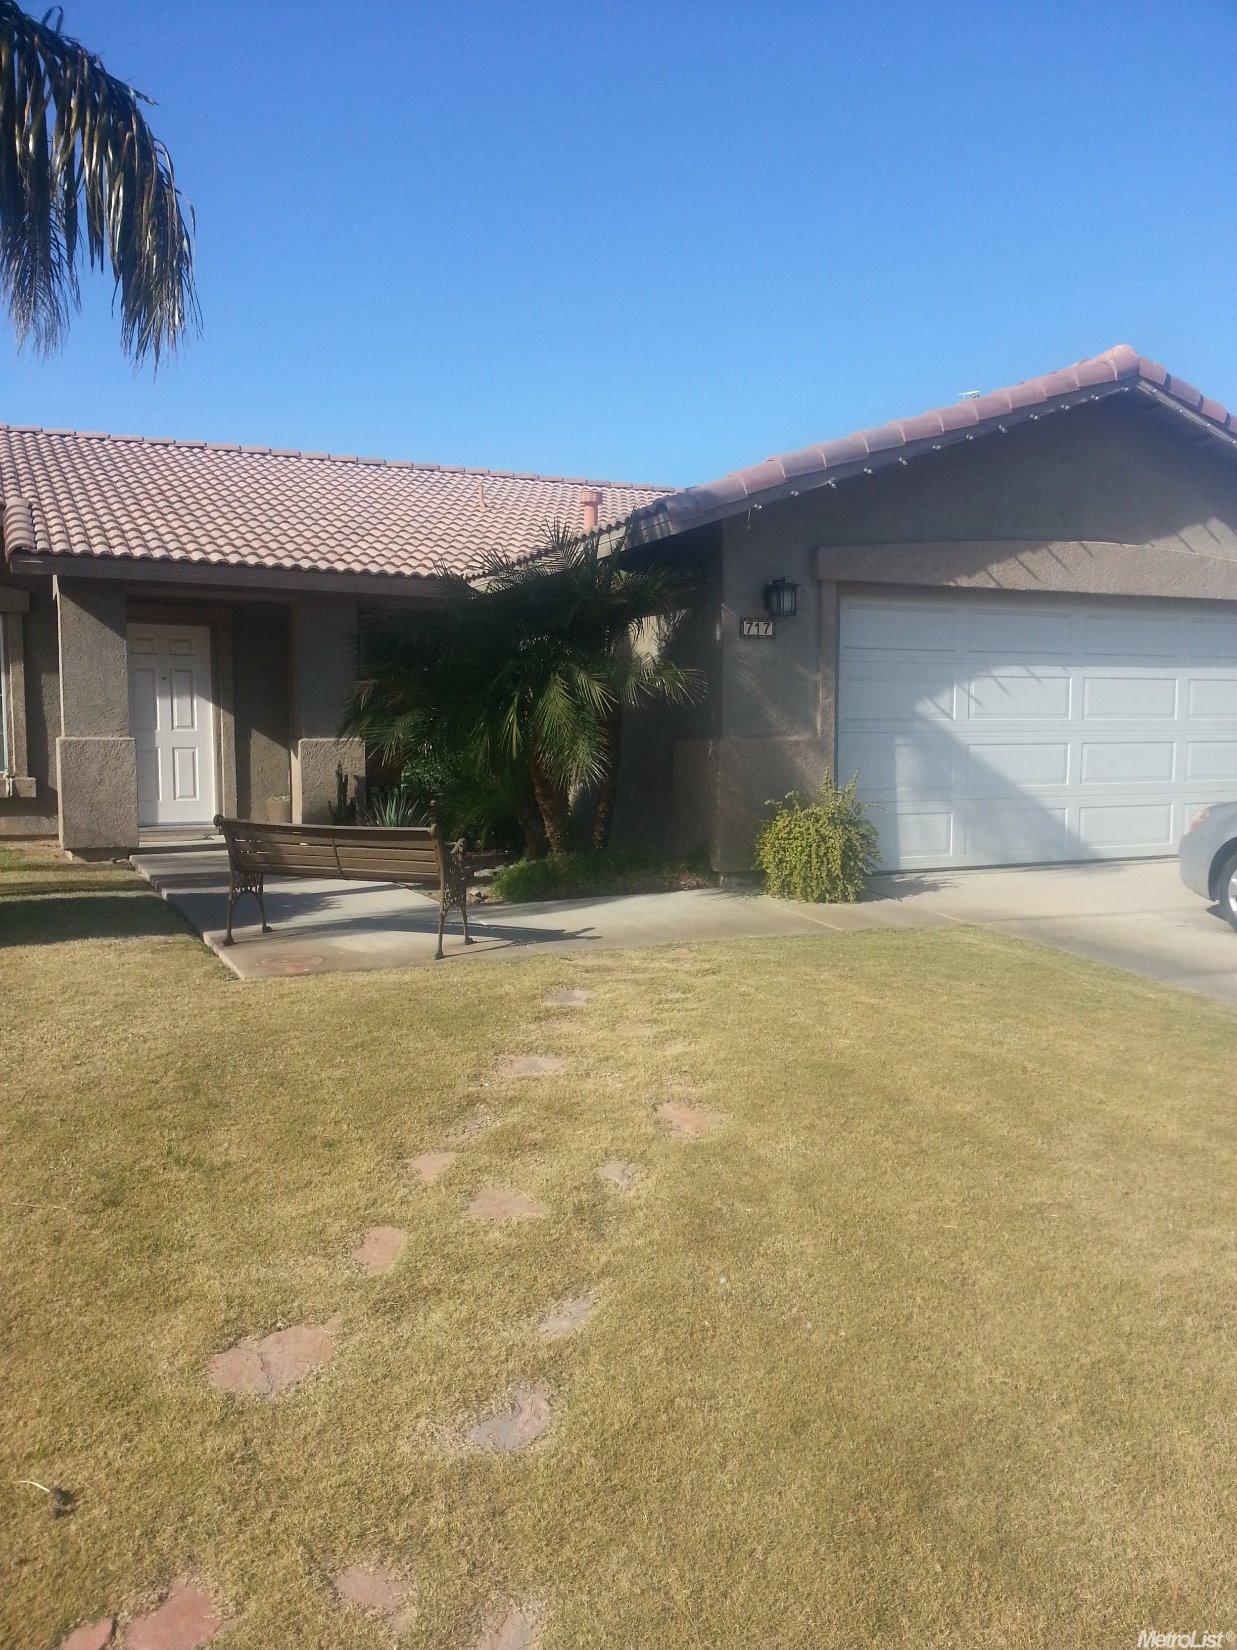 717 G Anaya, Calexico, CA